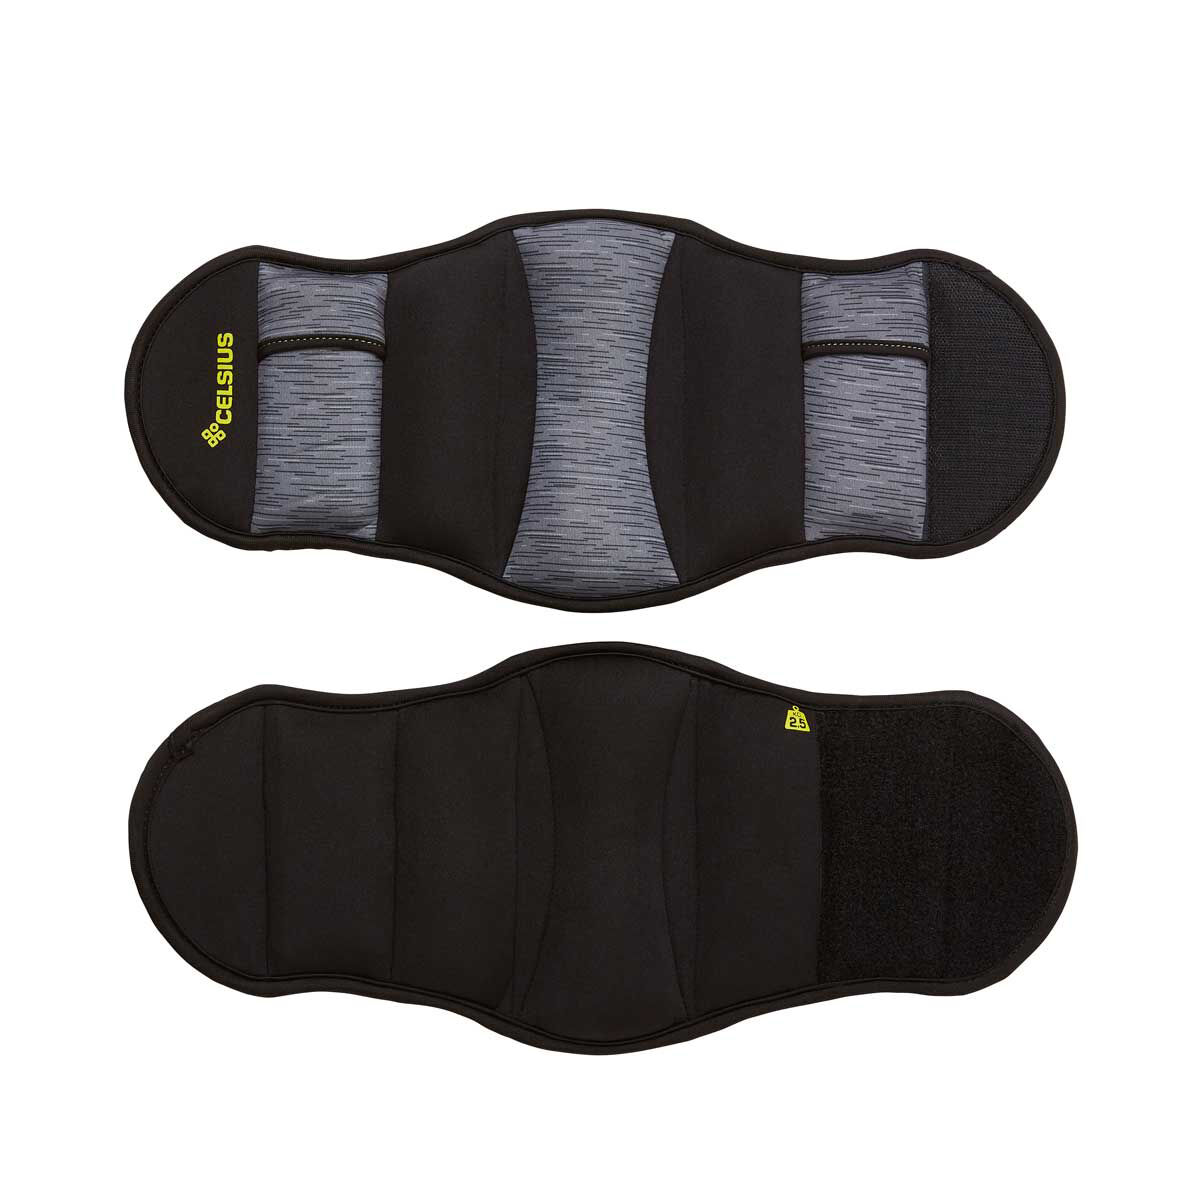 New Taekwondo Shoes Adidas Sm II ls, Sports on Carousell